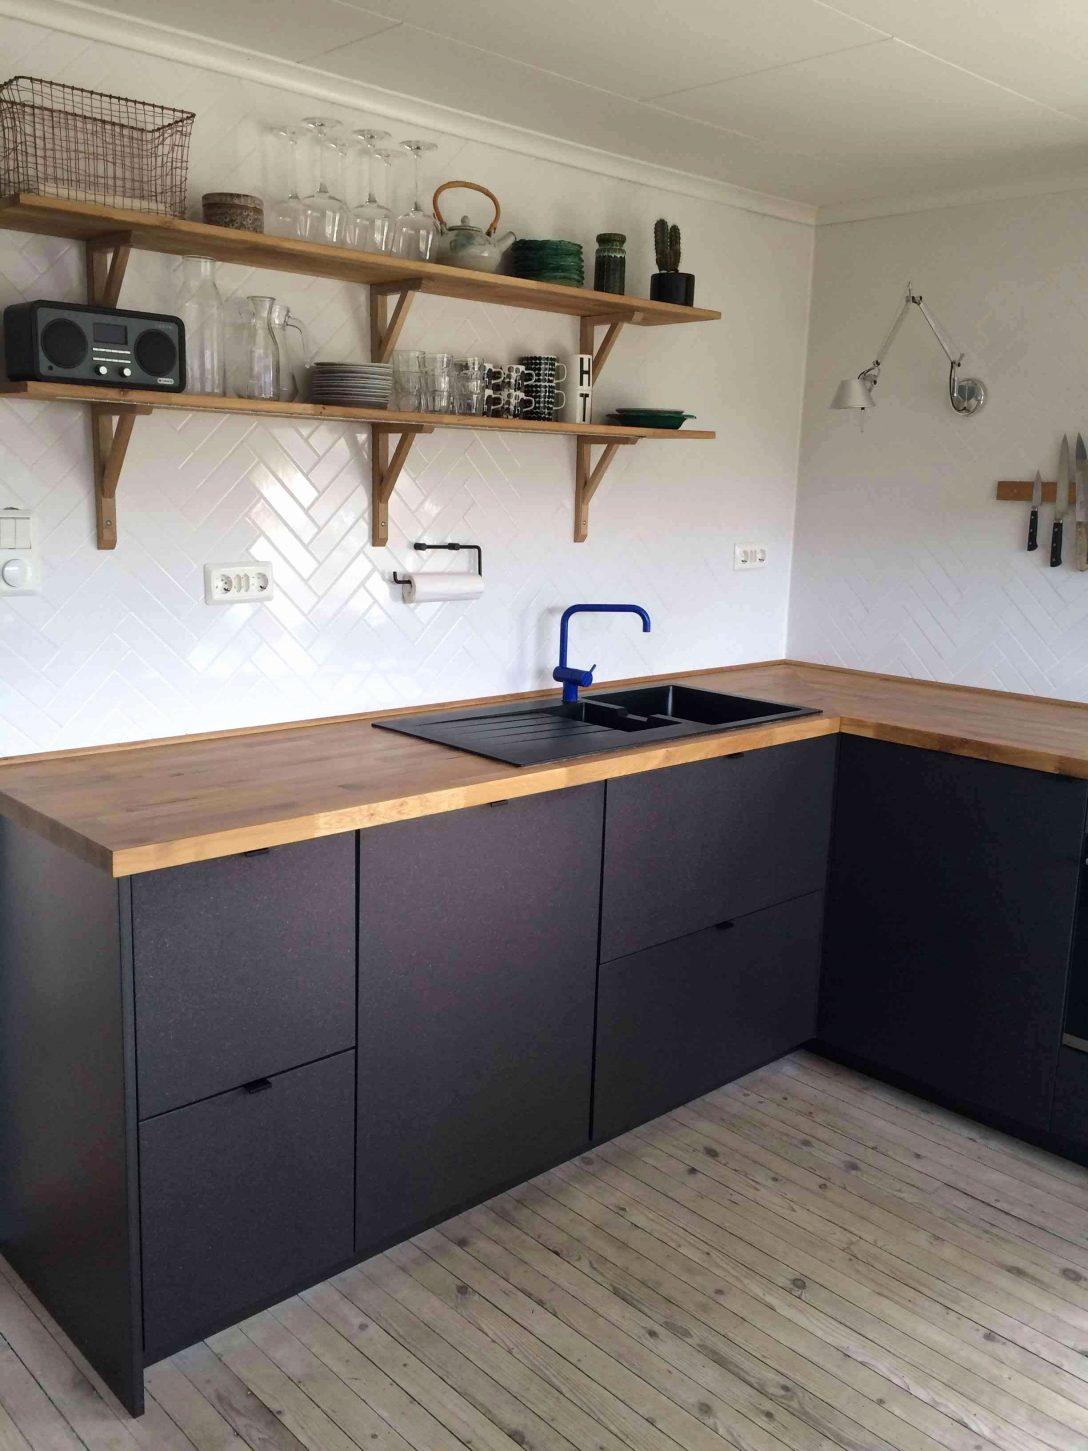 Large Size of Ikea Küchen Unterschrank Nvowuhftxbckzl7 Küche Küche Blende